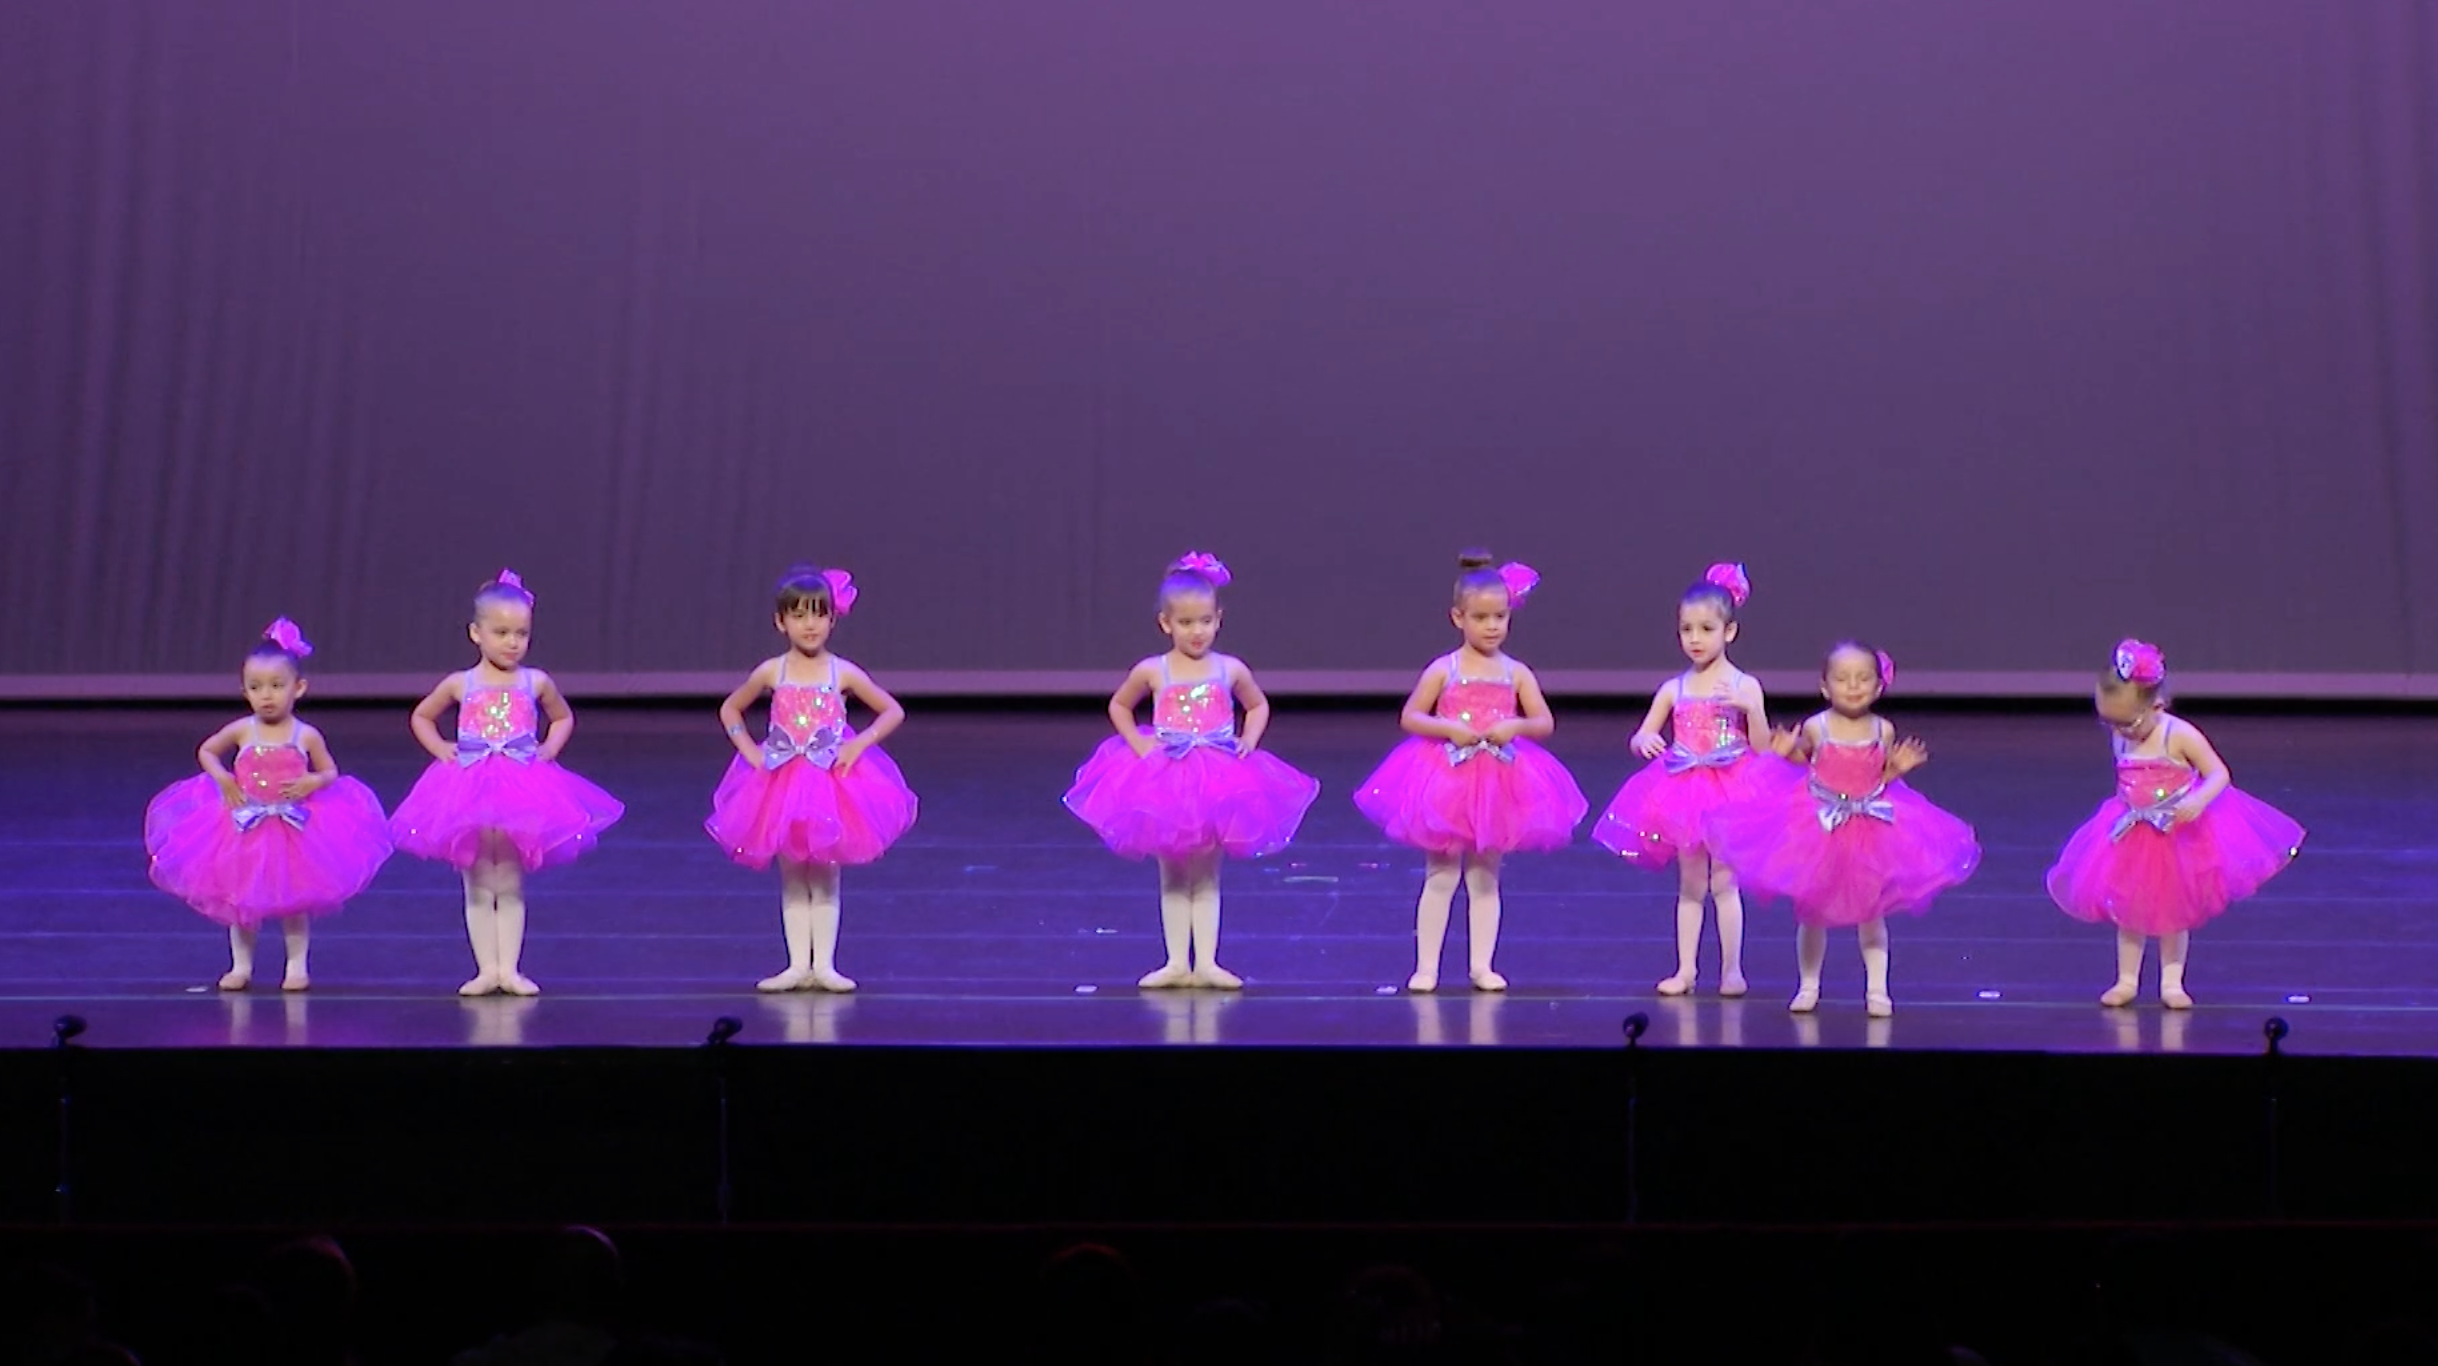 Mambo No 5 - Miami Dance Academy